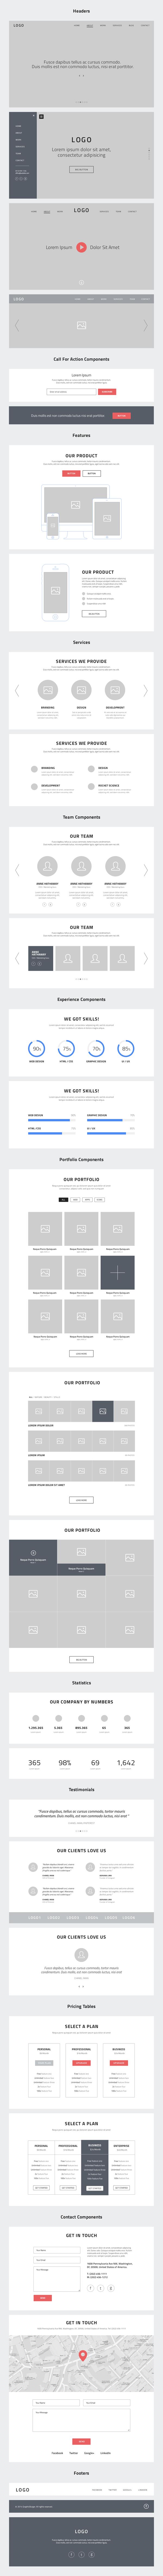 Mockup schemat strony typu One Page